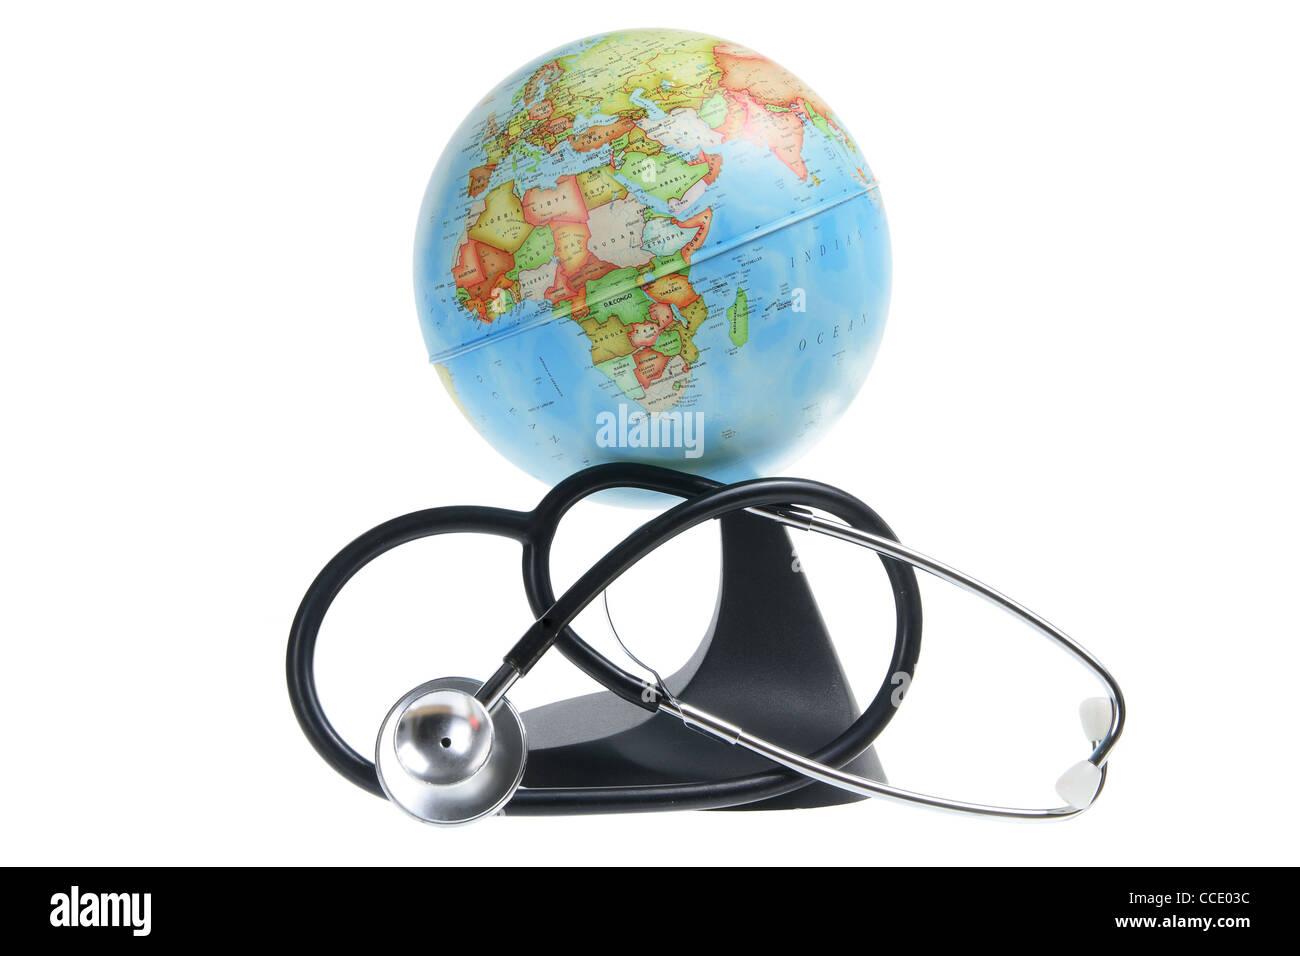 Globe and Stethoscope Photo Stock